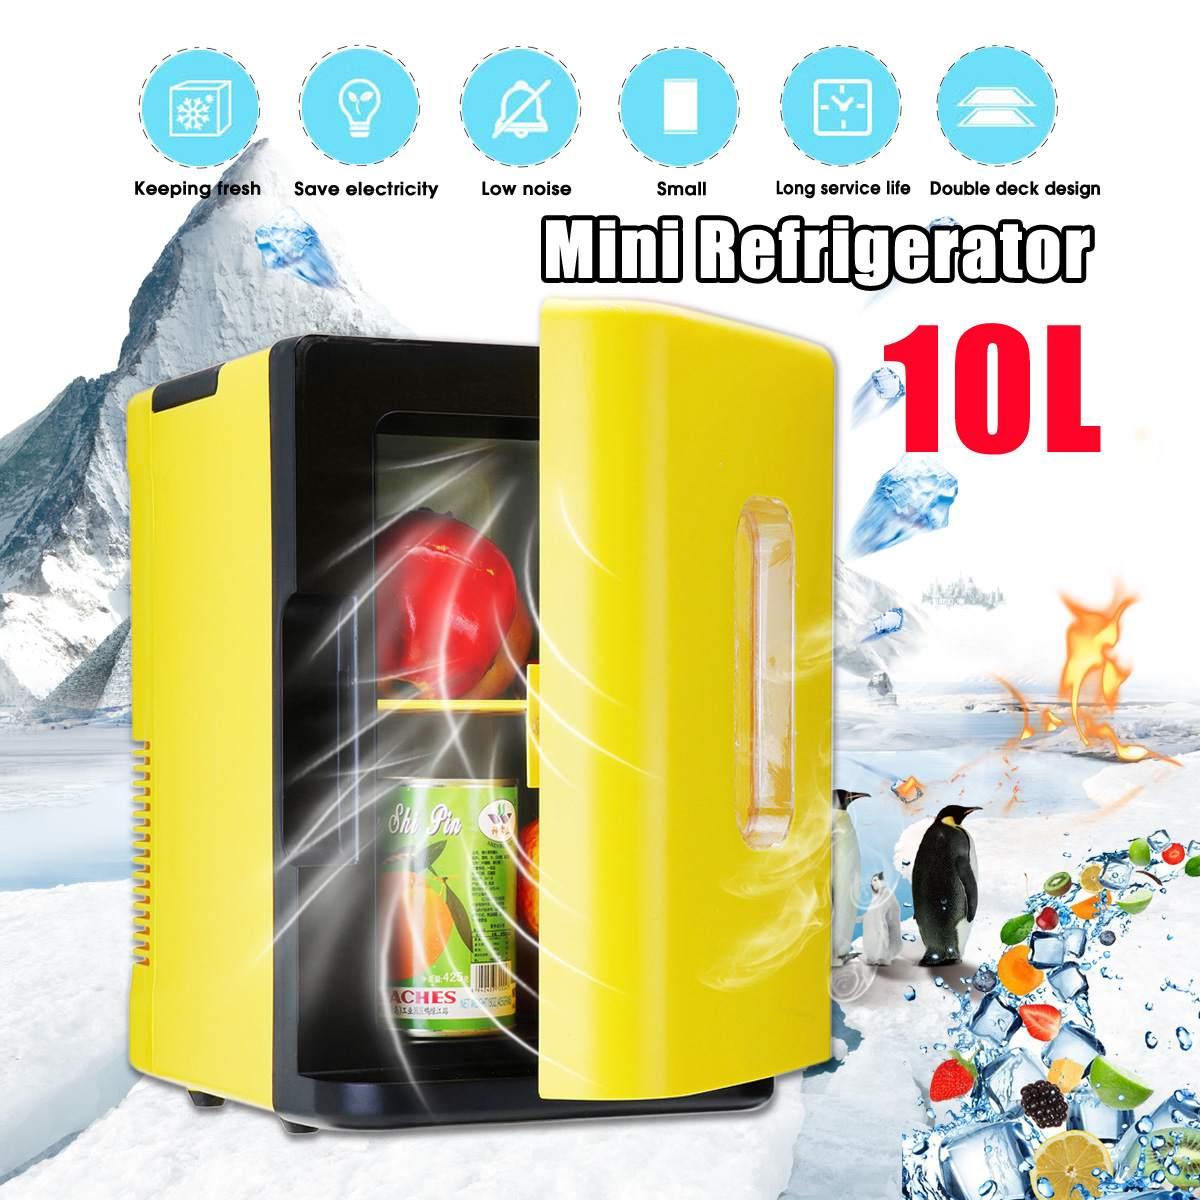 Electric Refrigerator 10L Small Refrigerator Multi-Purpose Refrigerator Home 220V